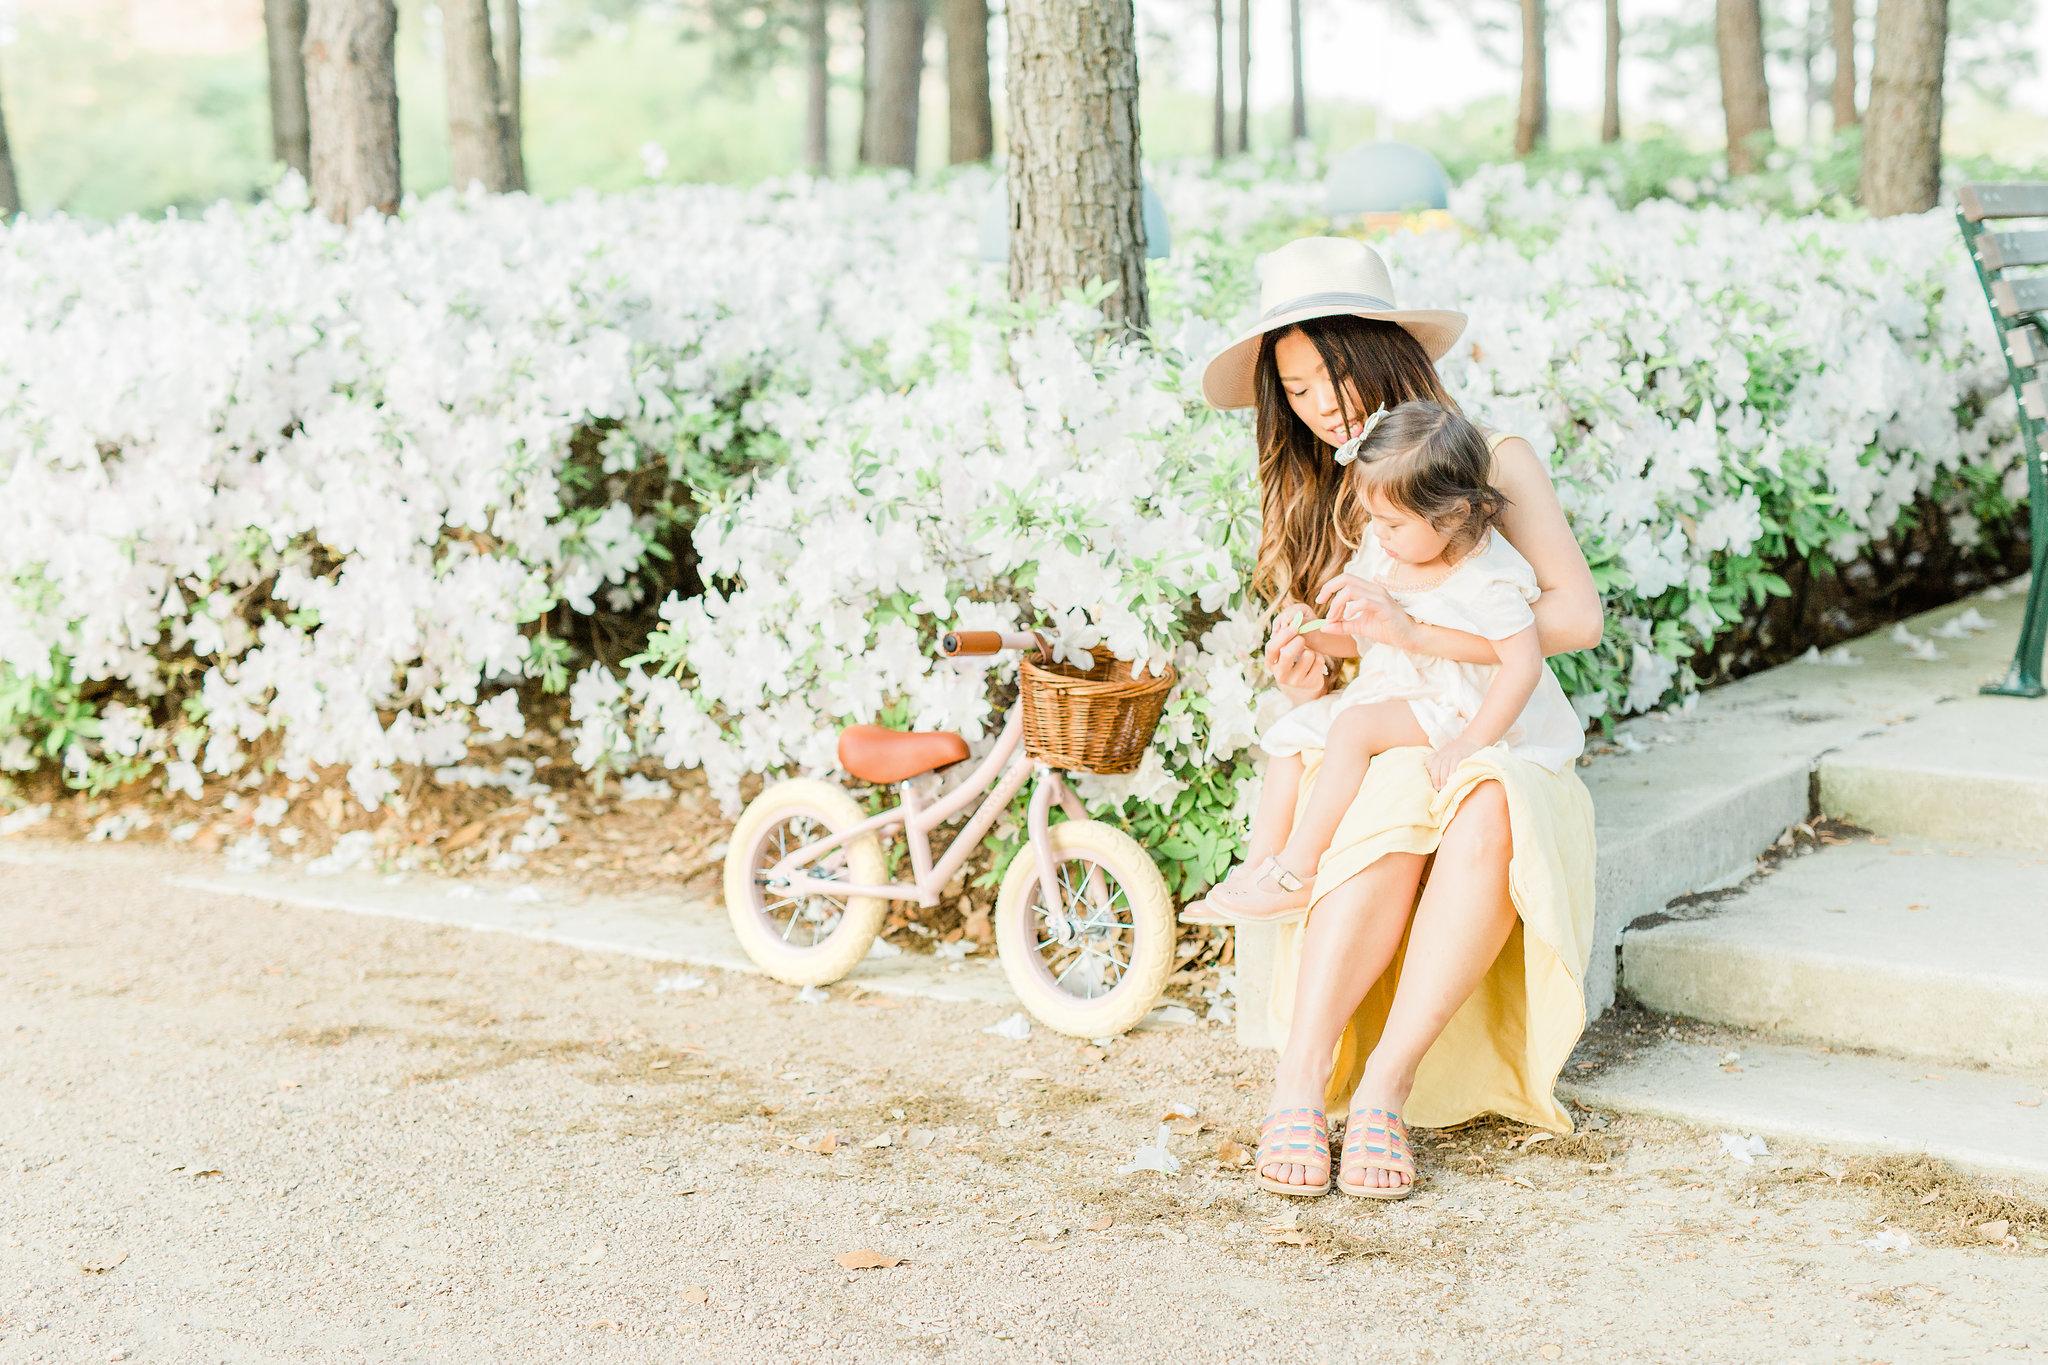 Joyfullygreen Comfortiva Brileigh Houston Azalea Trail Photoshoot Louise Misha Banwood Bike 2.jpg